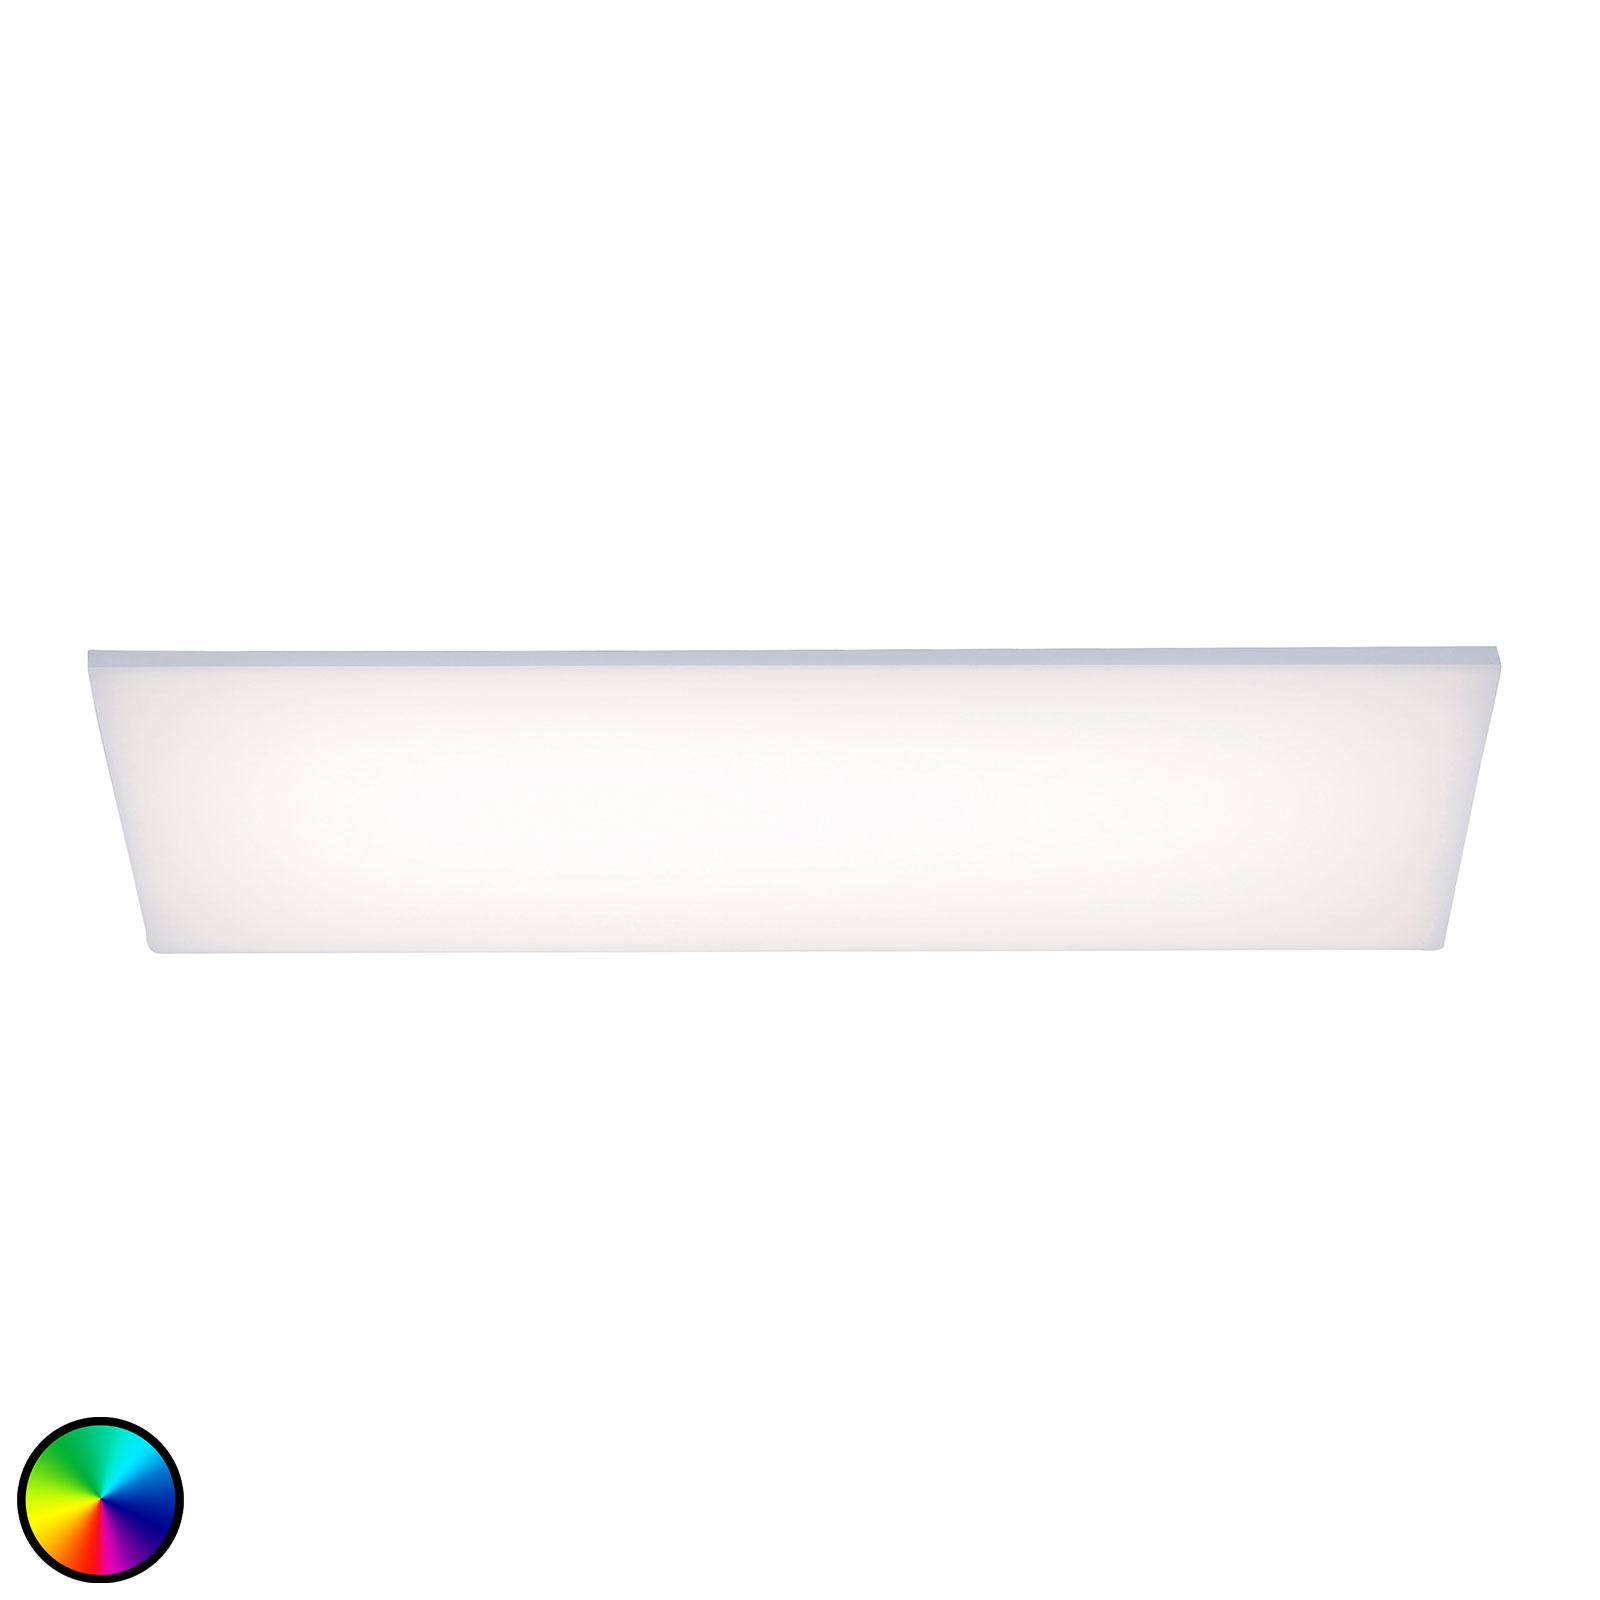 Paul Neuhaus Framless taklampe RGBW 60x30cm